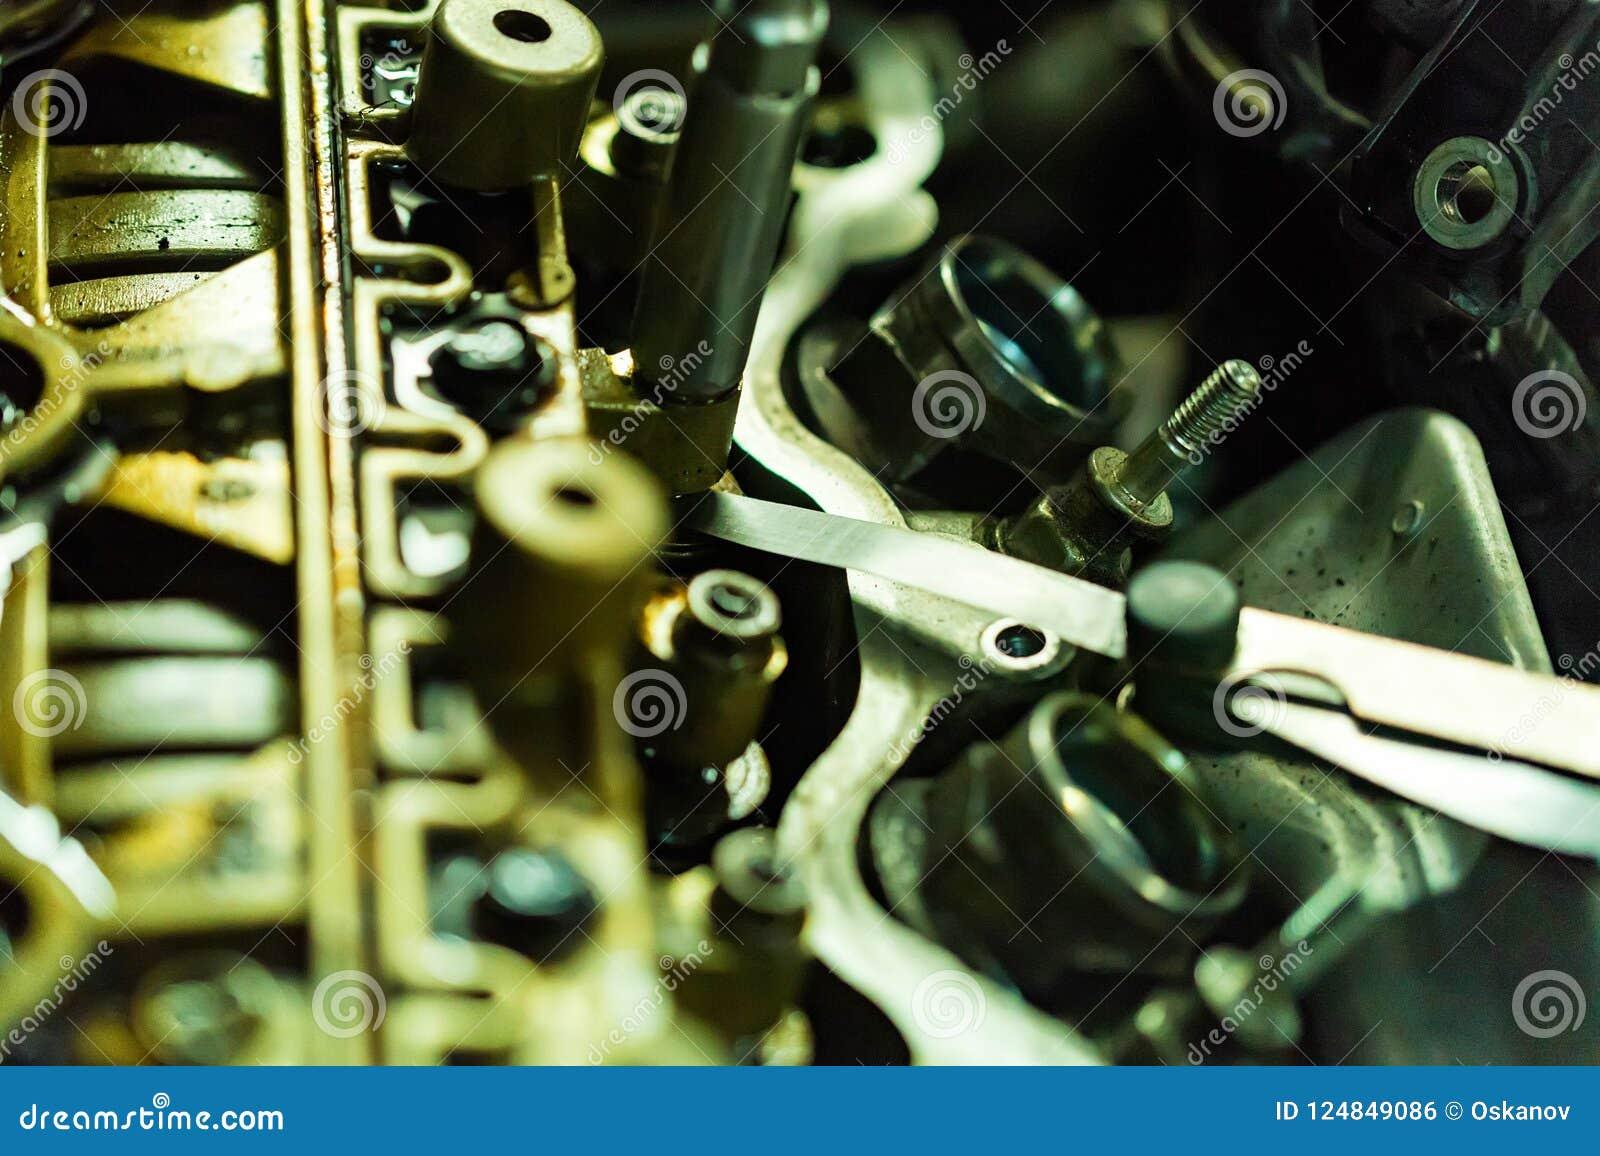 Maintenance Check And Adjust Valve Lash In Car Engine Stock Photo